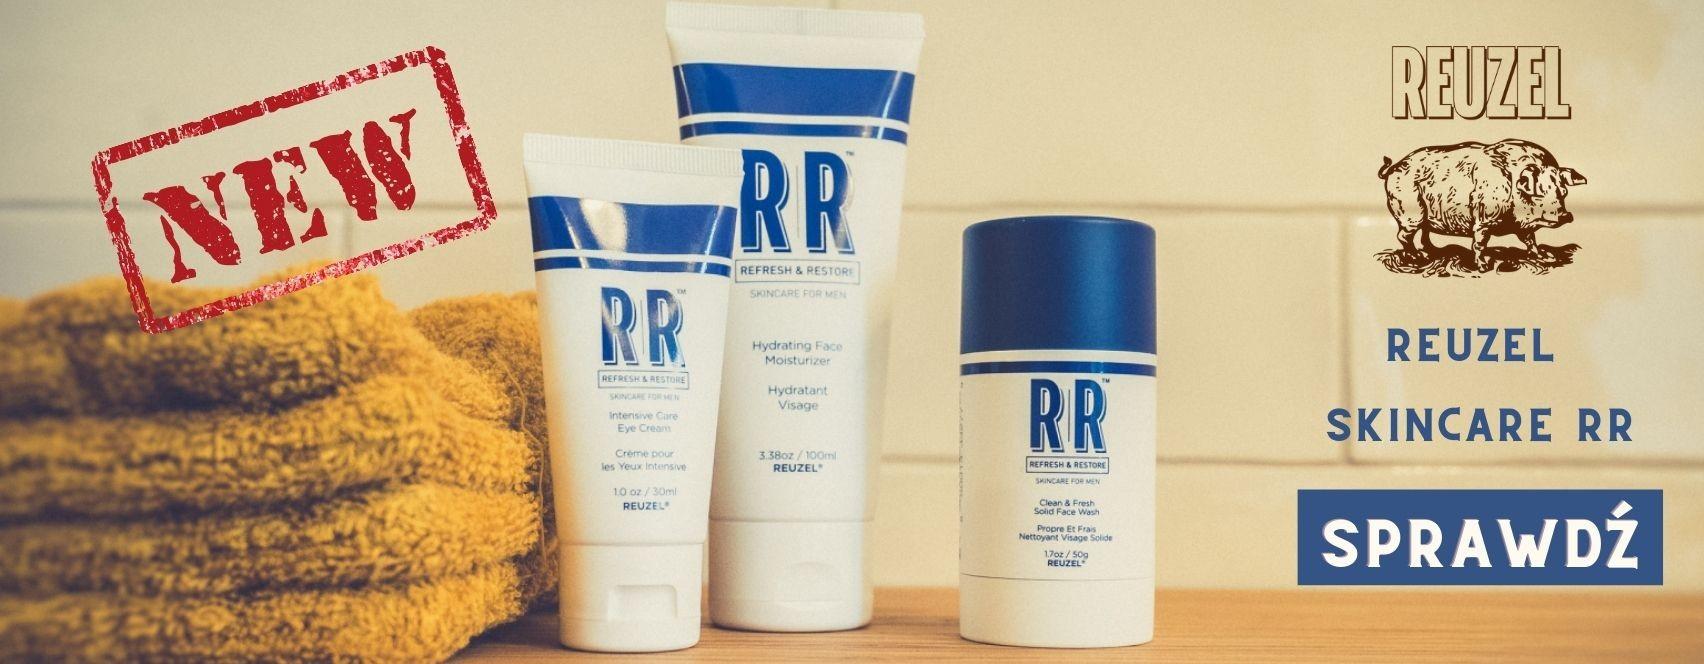 Reuzel_Skincare_RR